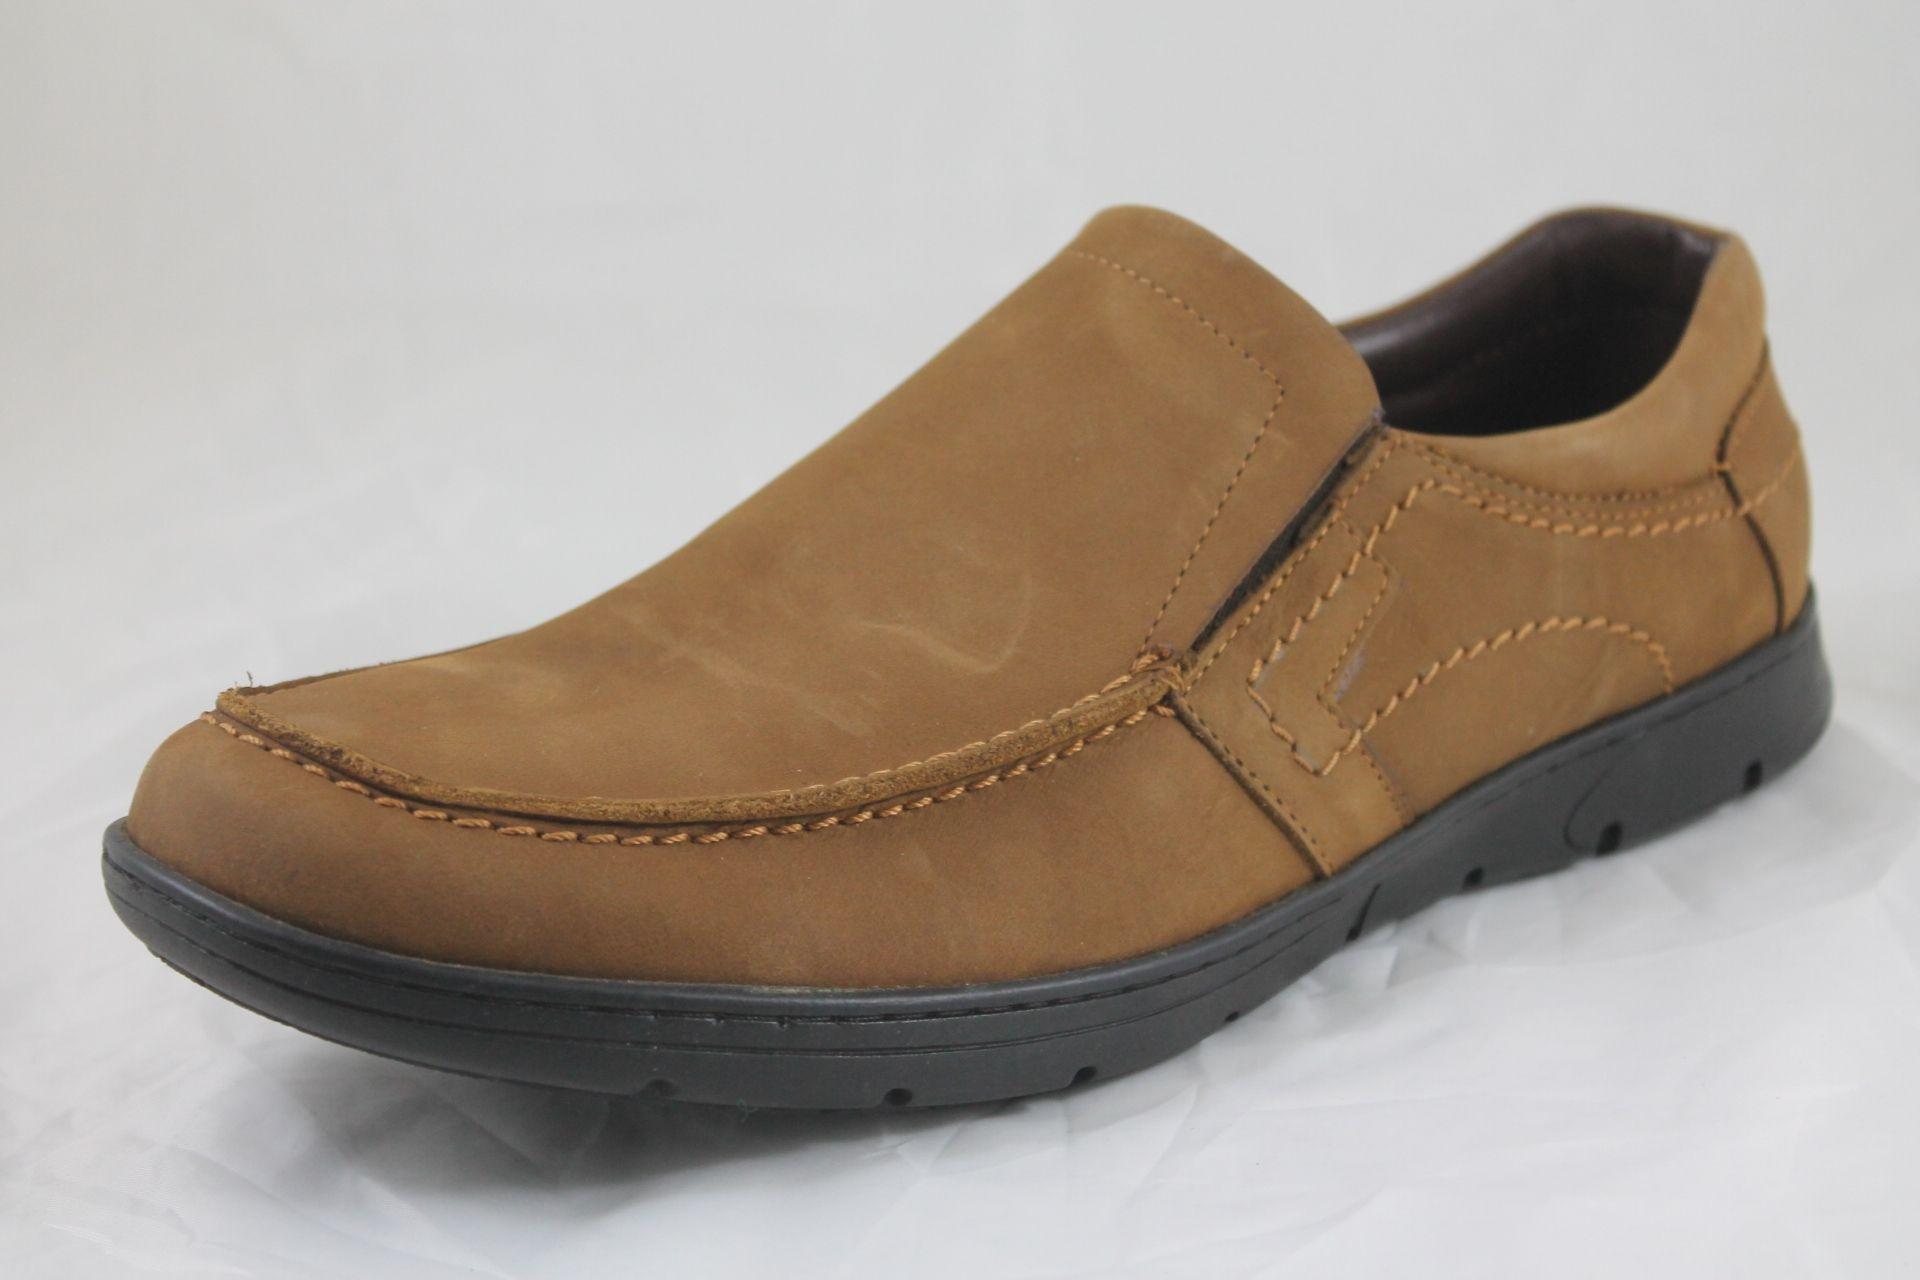 7315511c5 سعر Shoebox حذاء كاجوال شمواة - هافان فى مصر | جوميا | أحذية | كان بكام